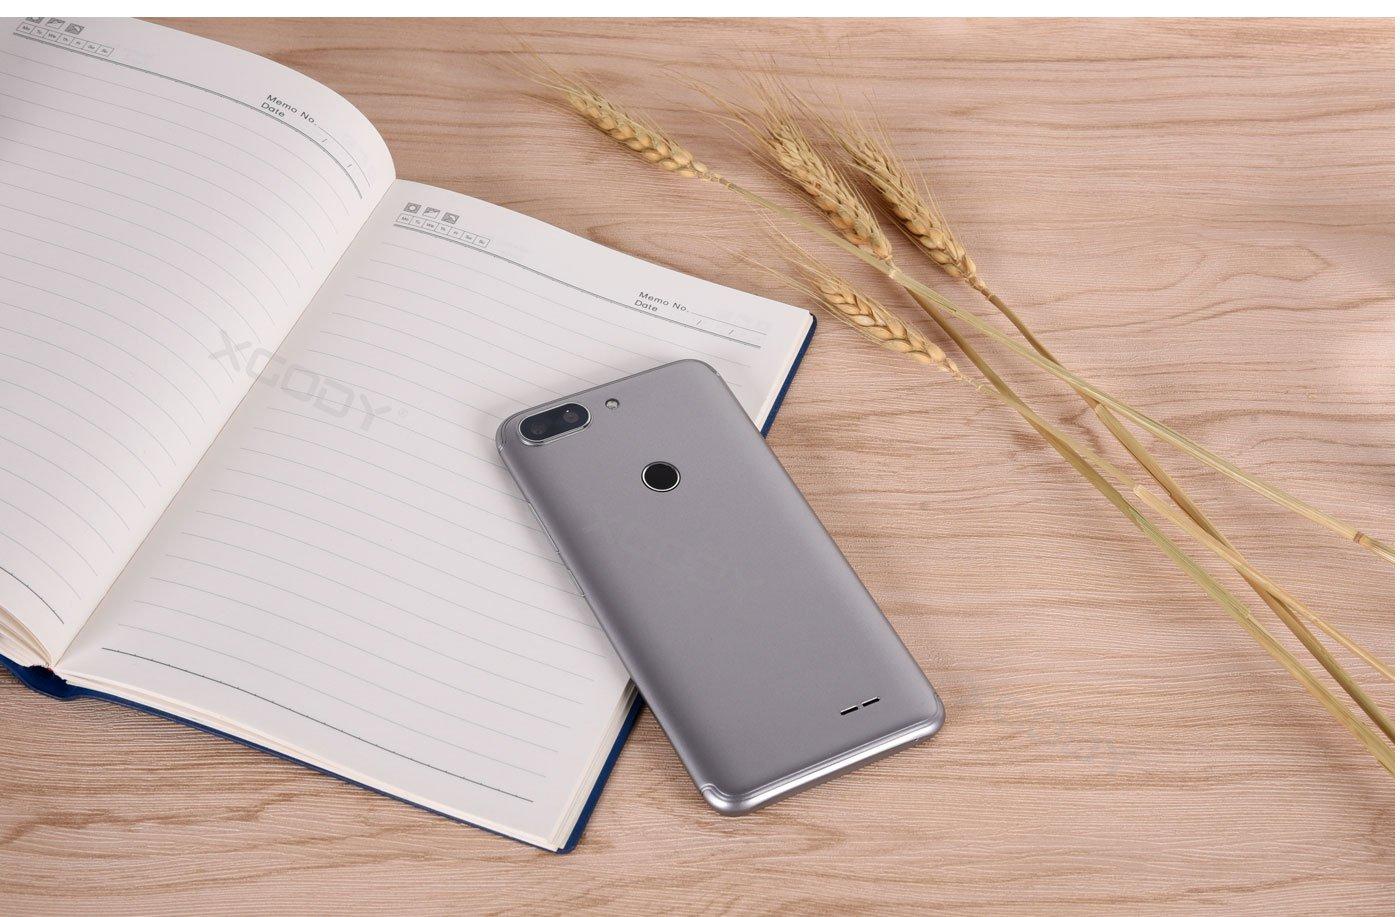 XGODY D27 Android 7.0 Unlocked Dual SIM 8GB Smartphone